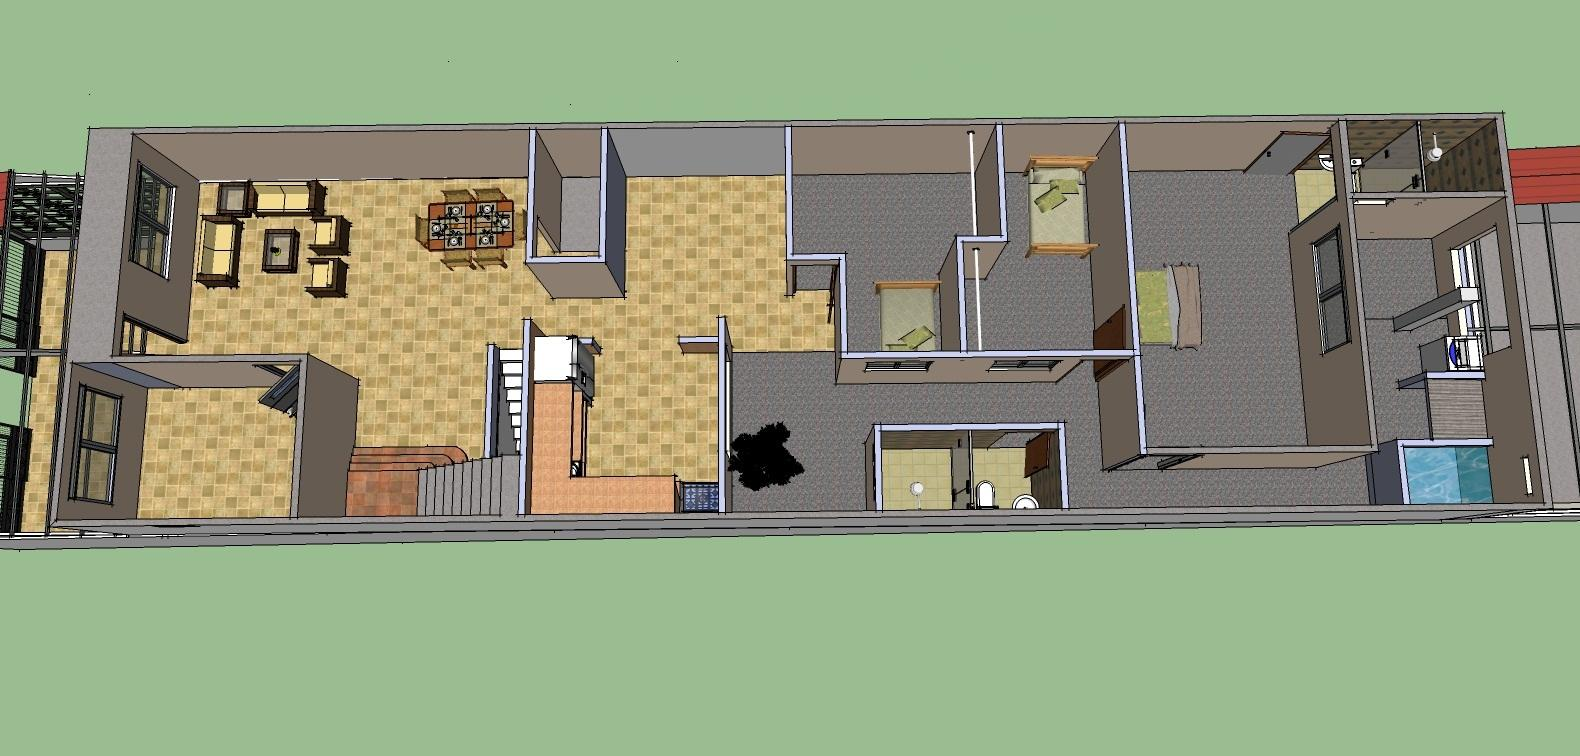 Pc solution desarrollo de software dise o de paginas for Software para diseno de casas